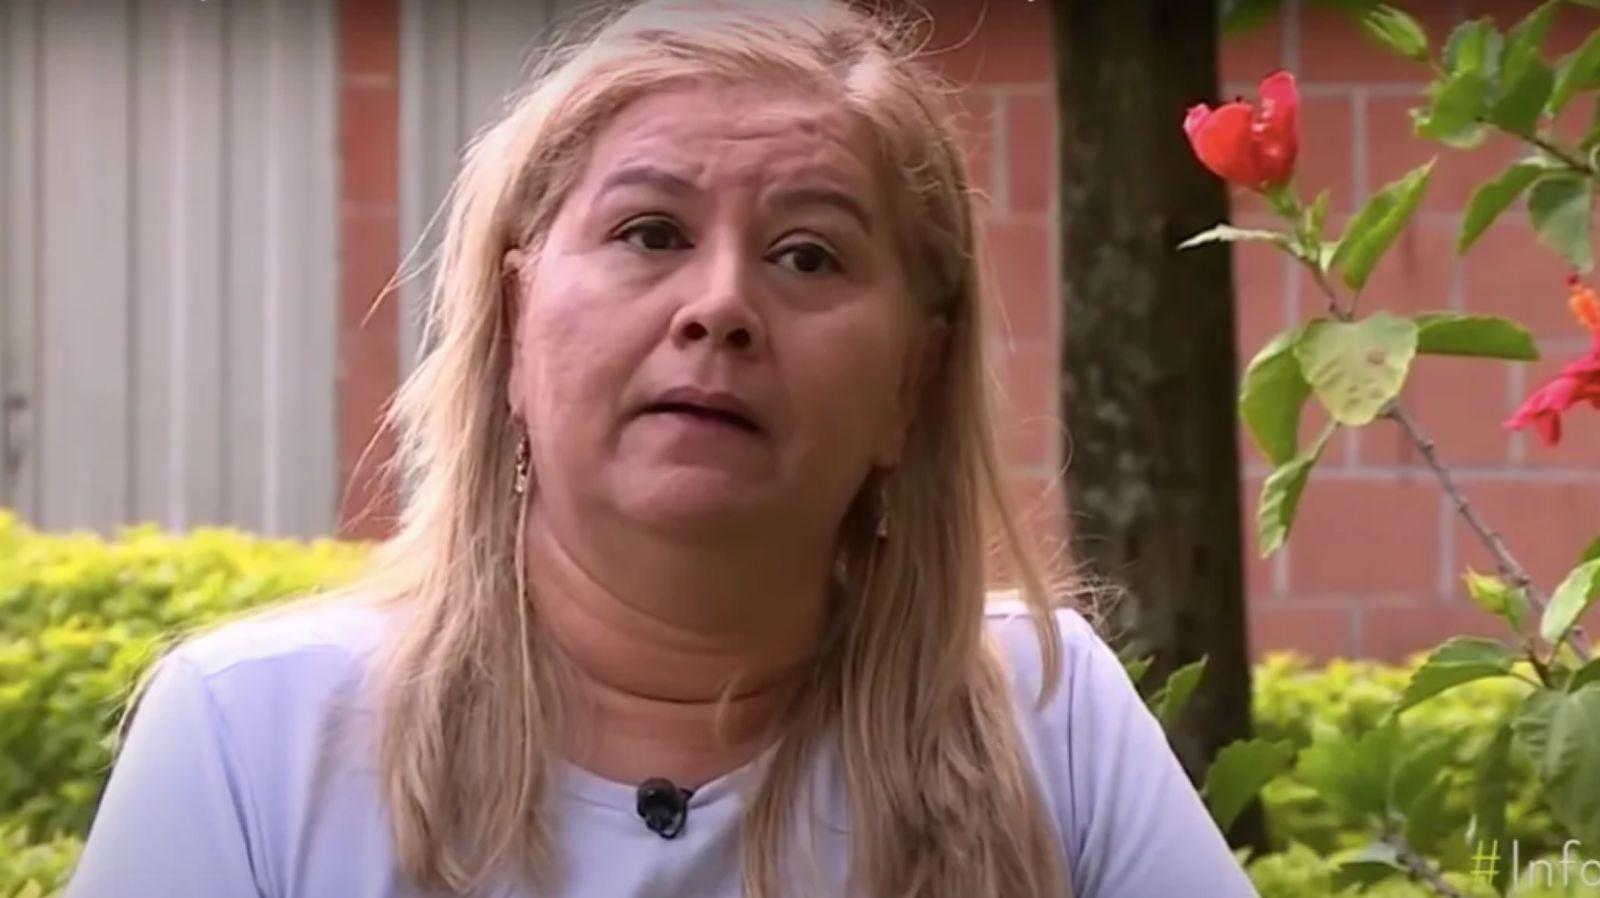 le cancelaron la eutanasia a la colombiana con esclerosis